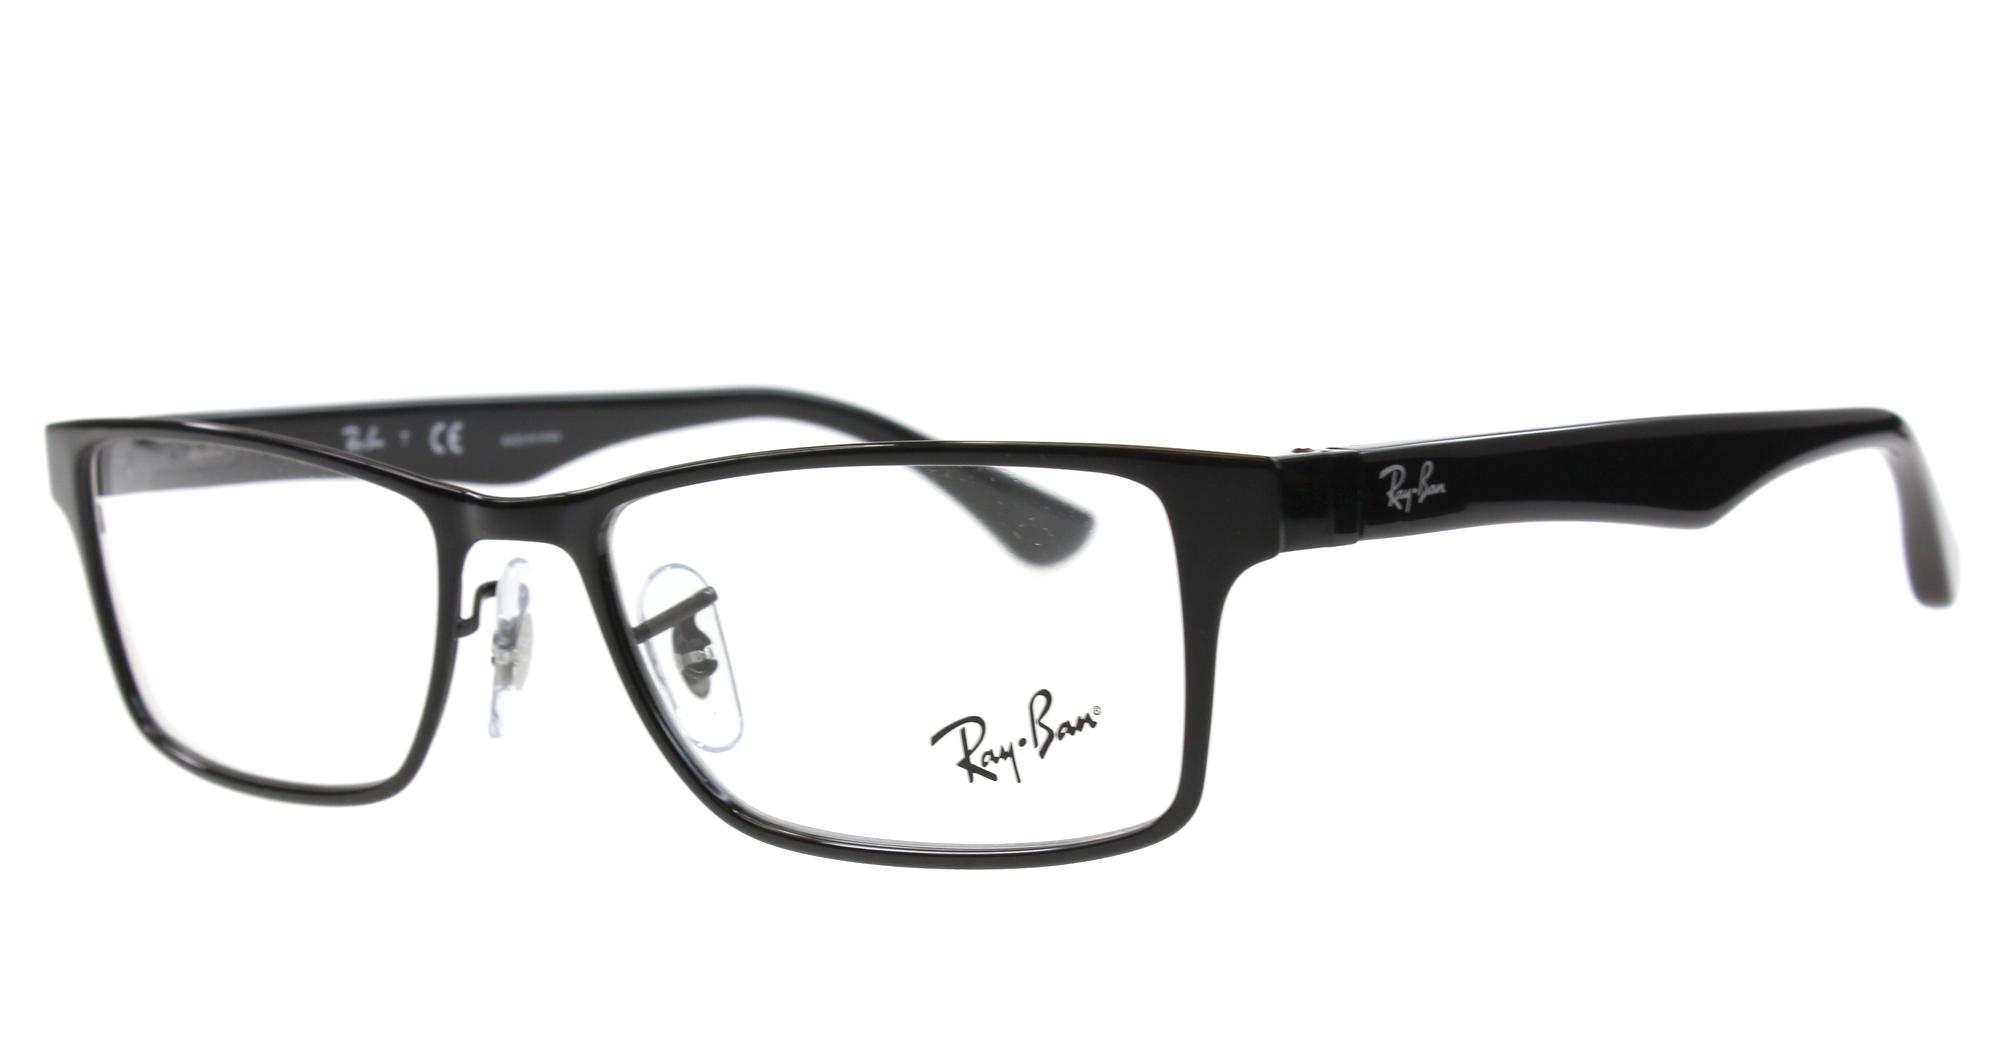 5ef175b8d1 ... ireland free shipping. ray ban rb 6238 2509 black frames d5998 59ac4 ...